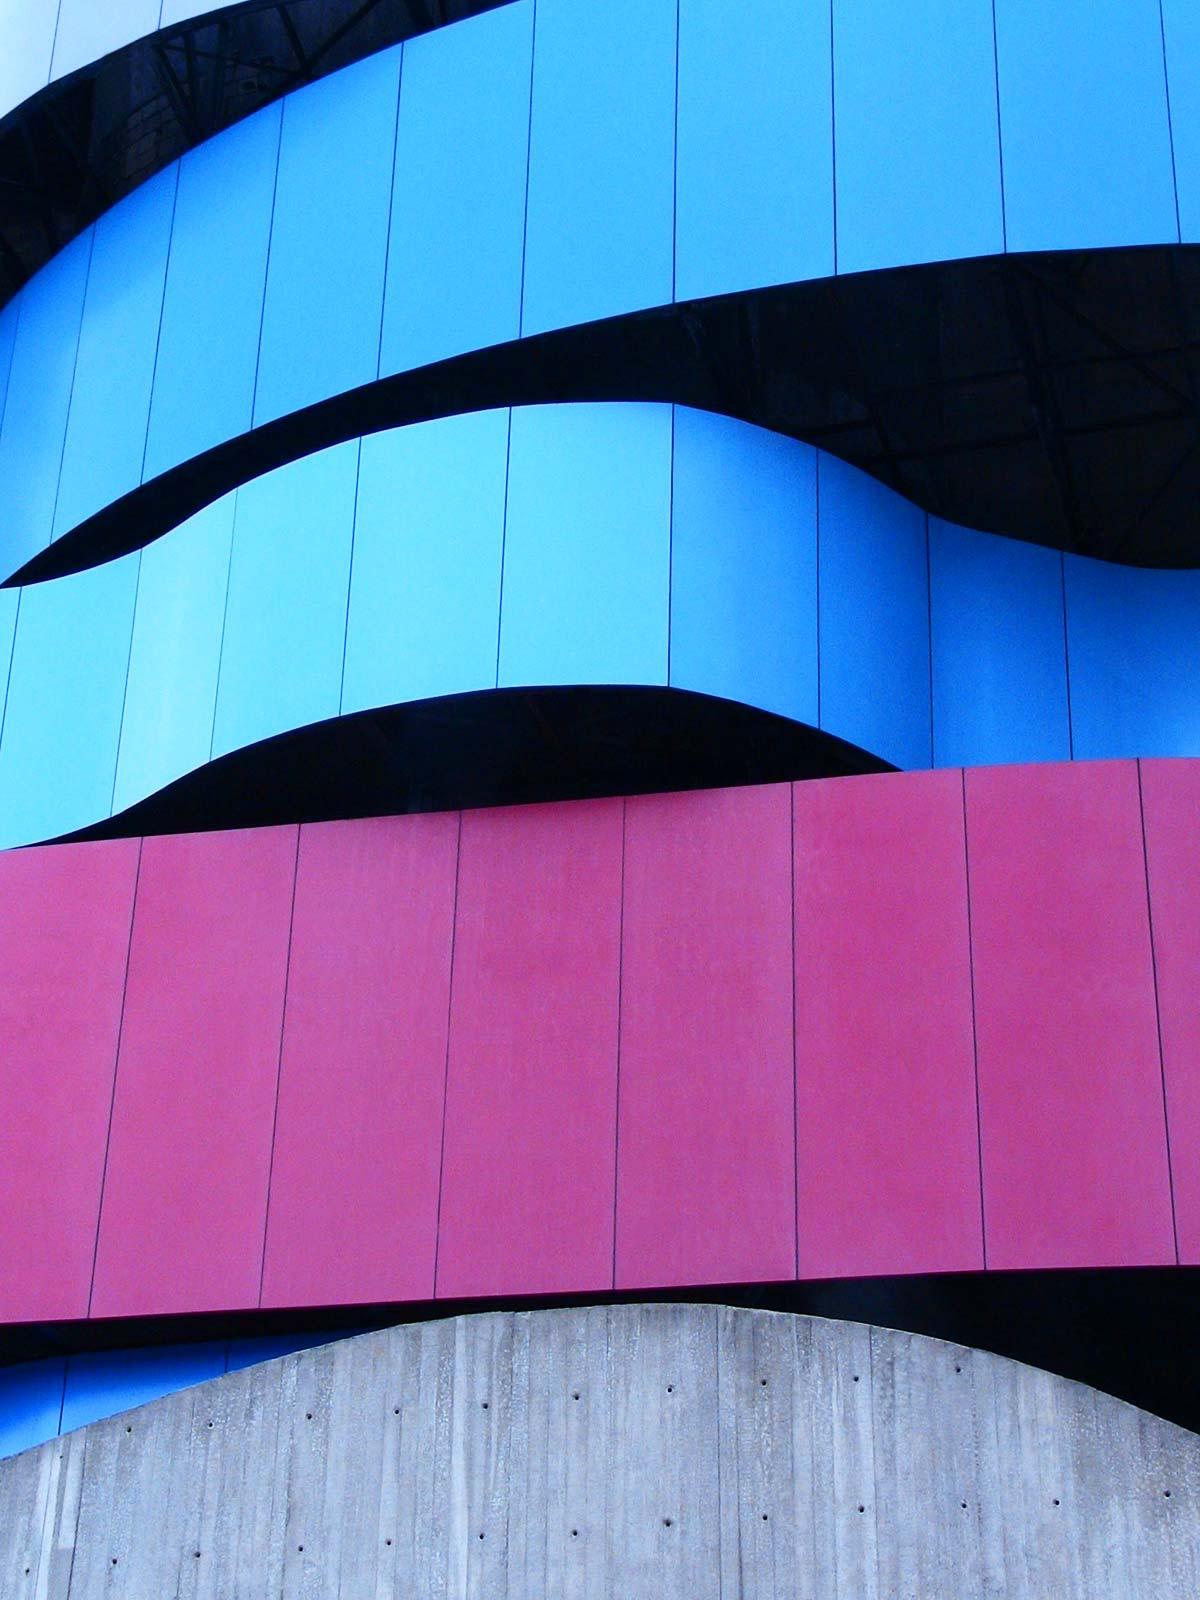 instituto-tomie-ohtake-sao-paulo-pinkblau